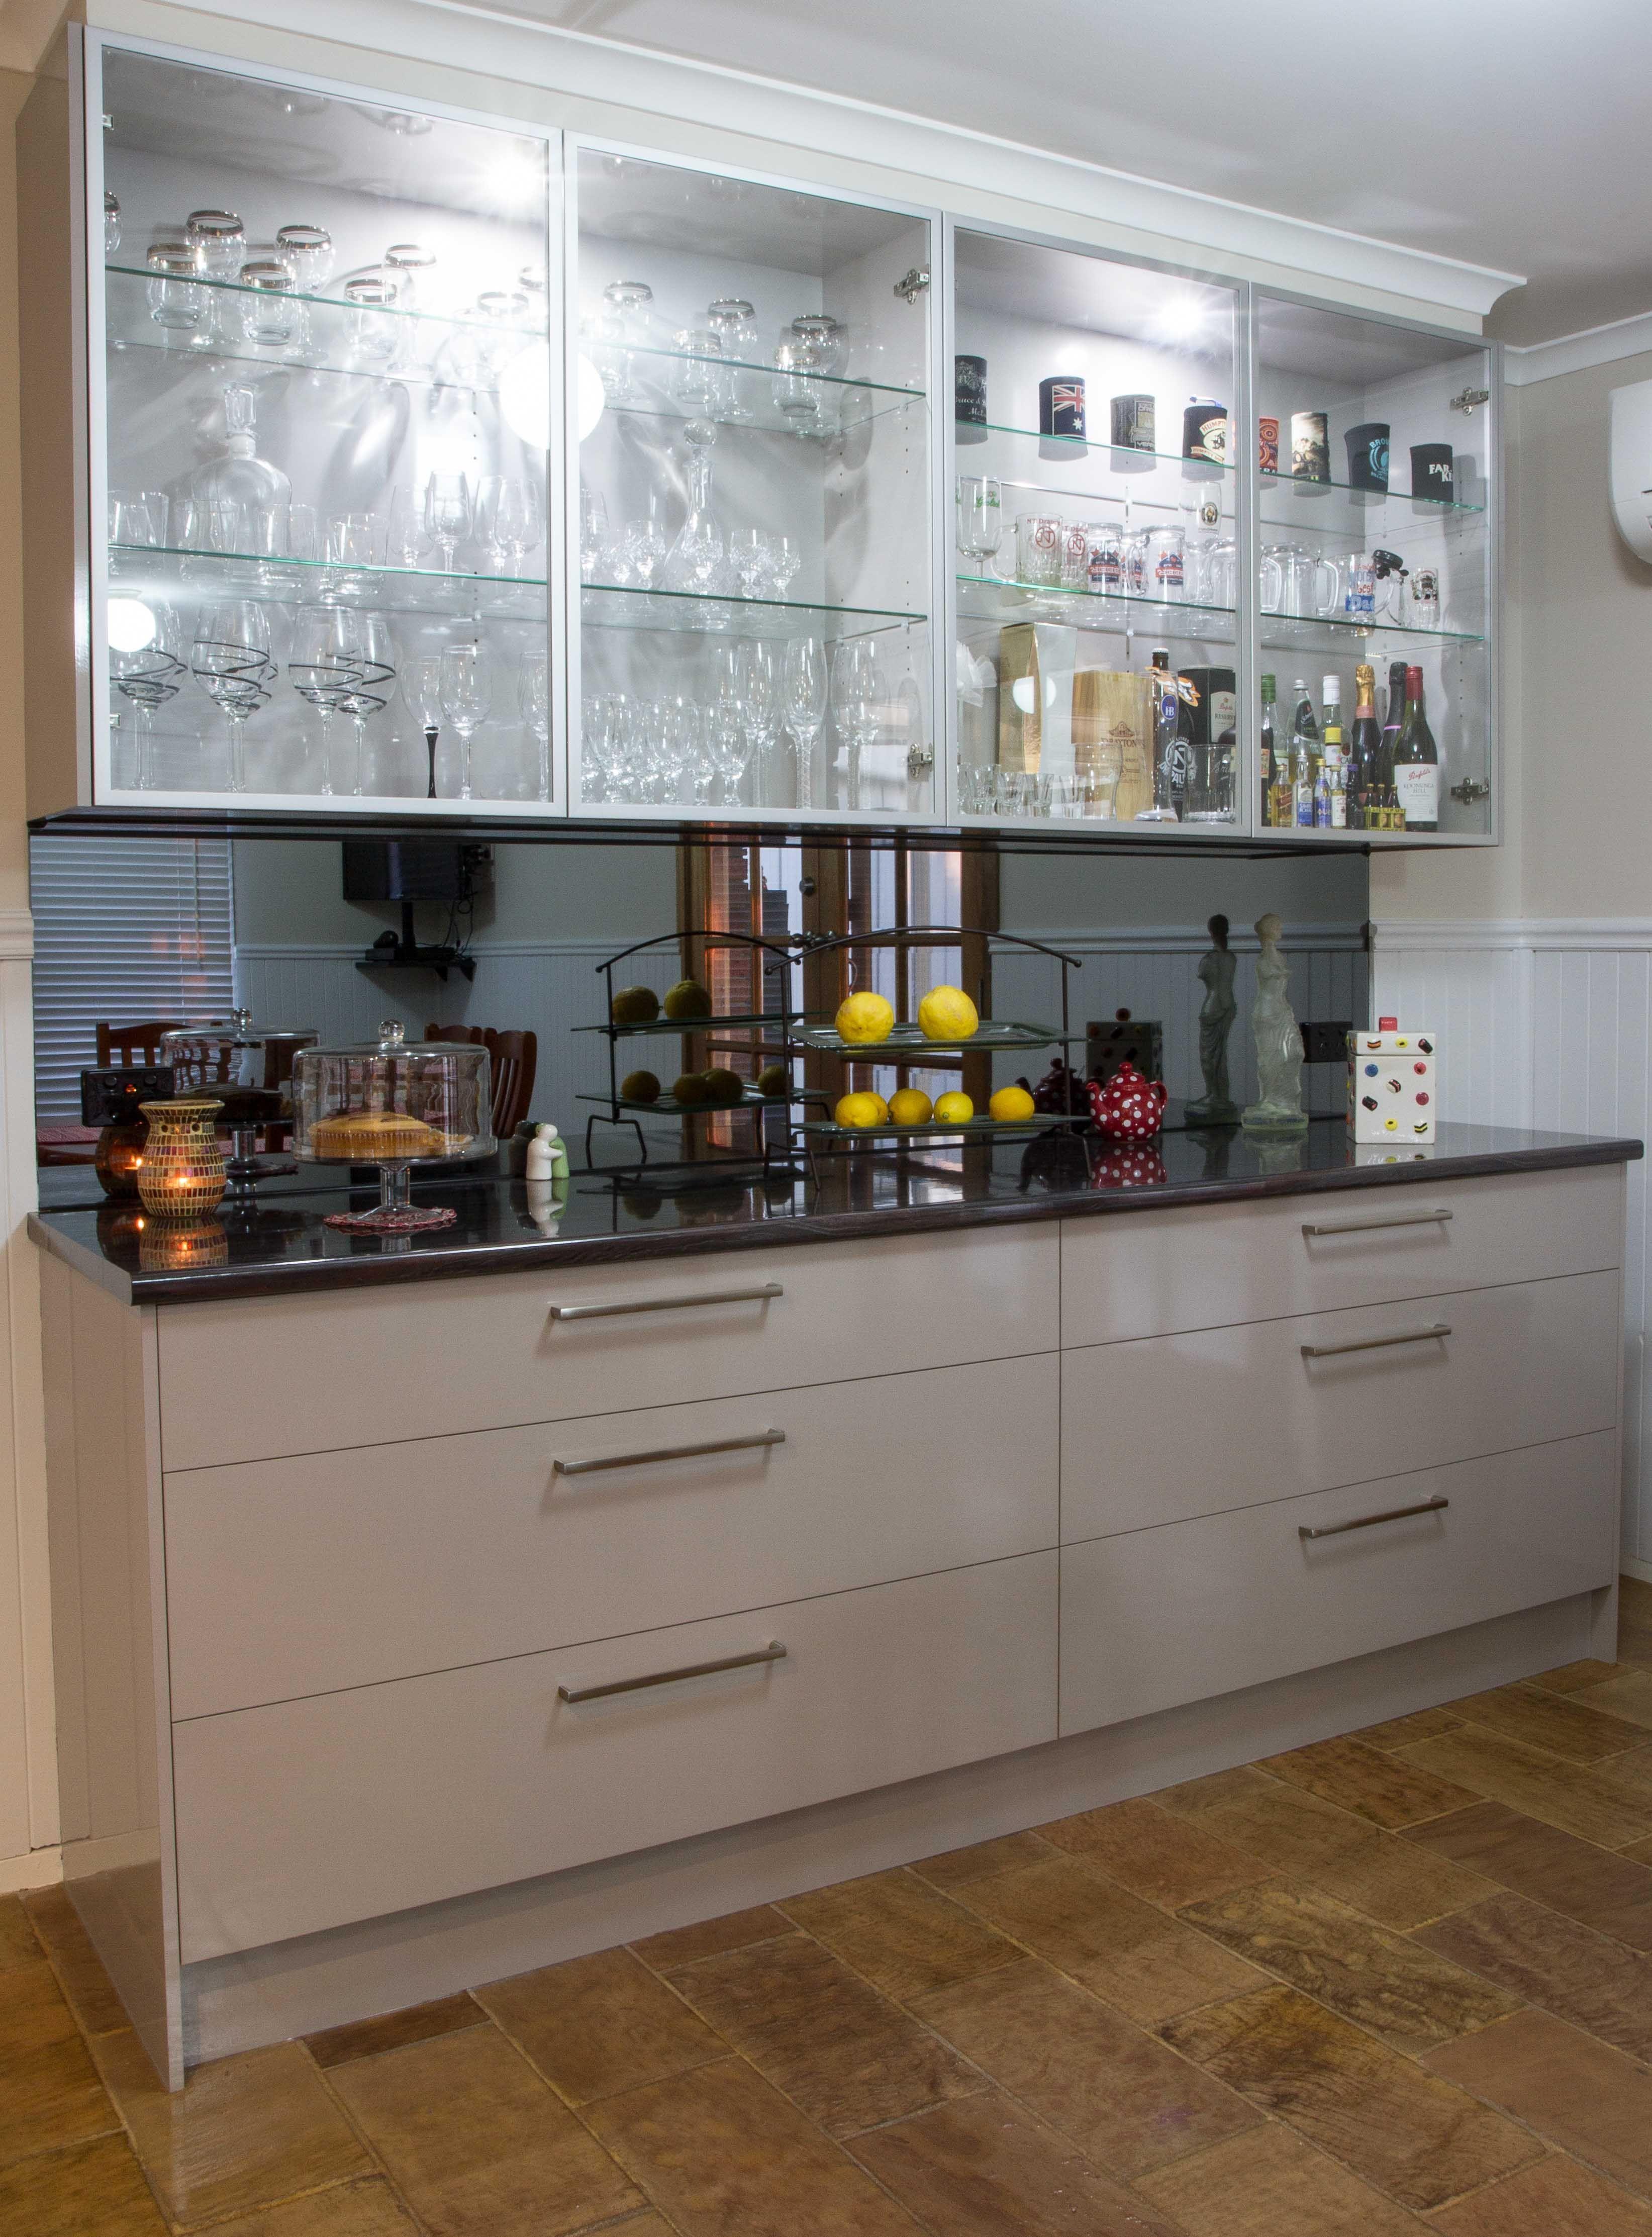 glass overhead cabinet doors smoked mirror splashback wwwthekitchendesigncentre. Interior Design Ideas. Home Design Ideas